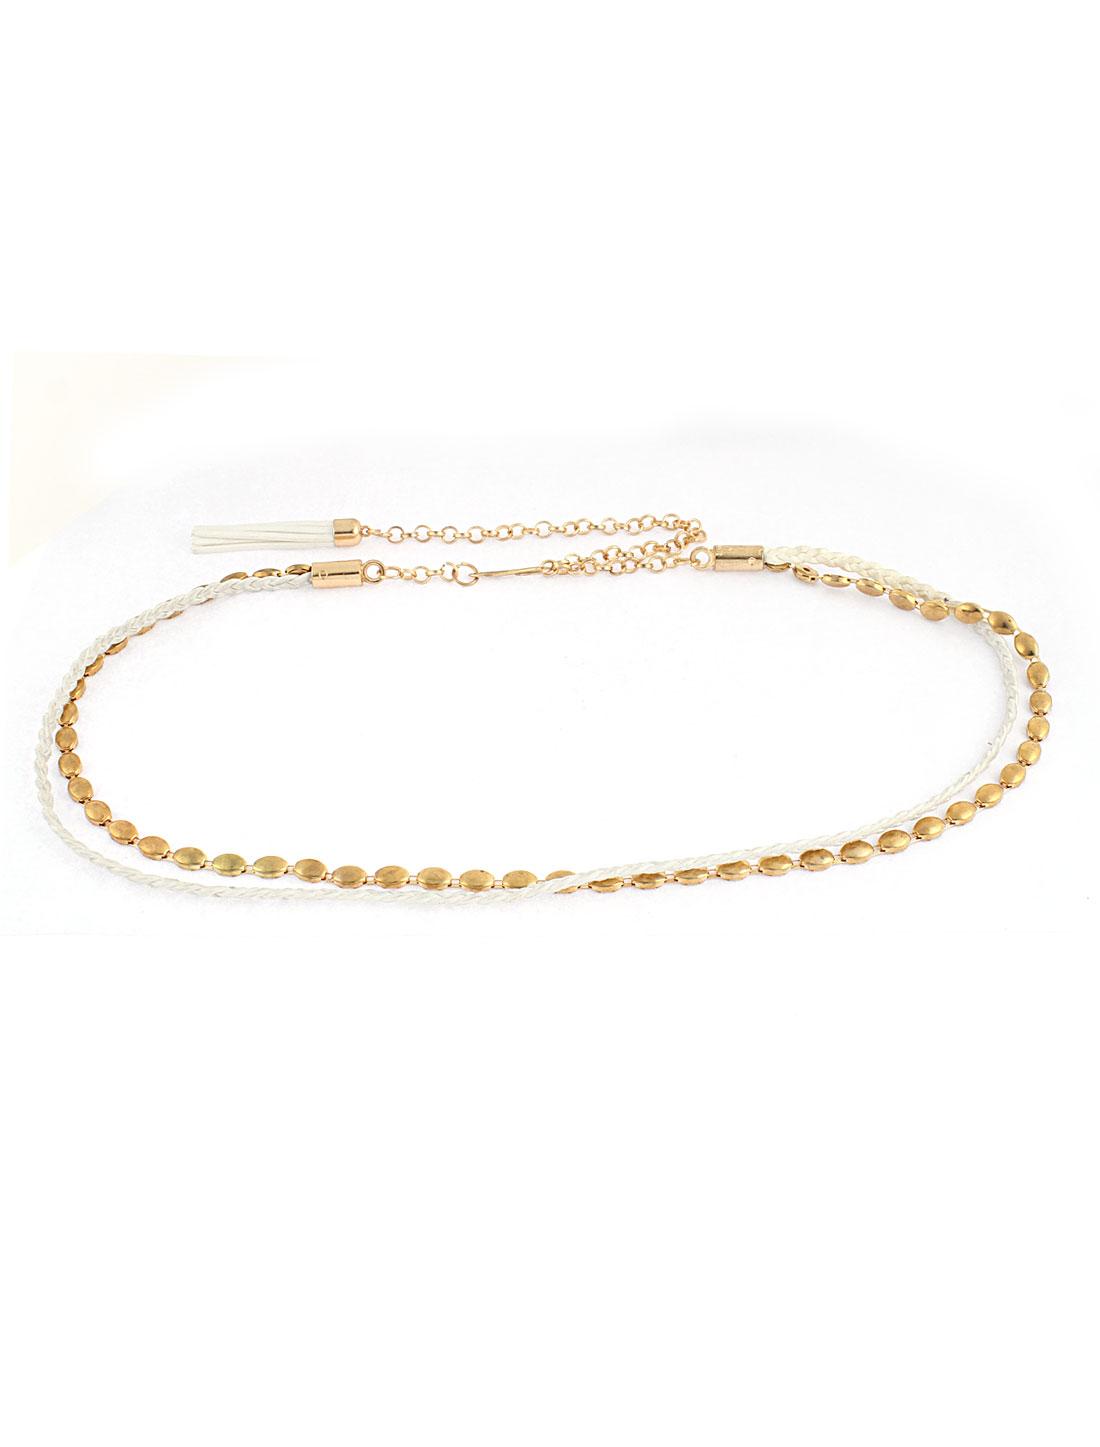 Gold Tone Adjustable Hook Closure Waist Chain Belt for Women